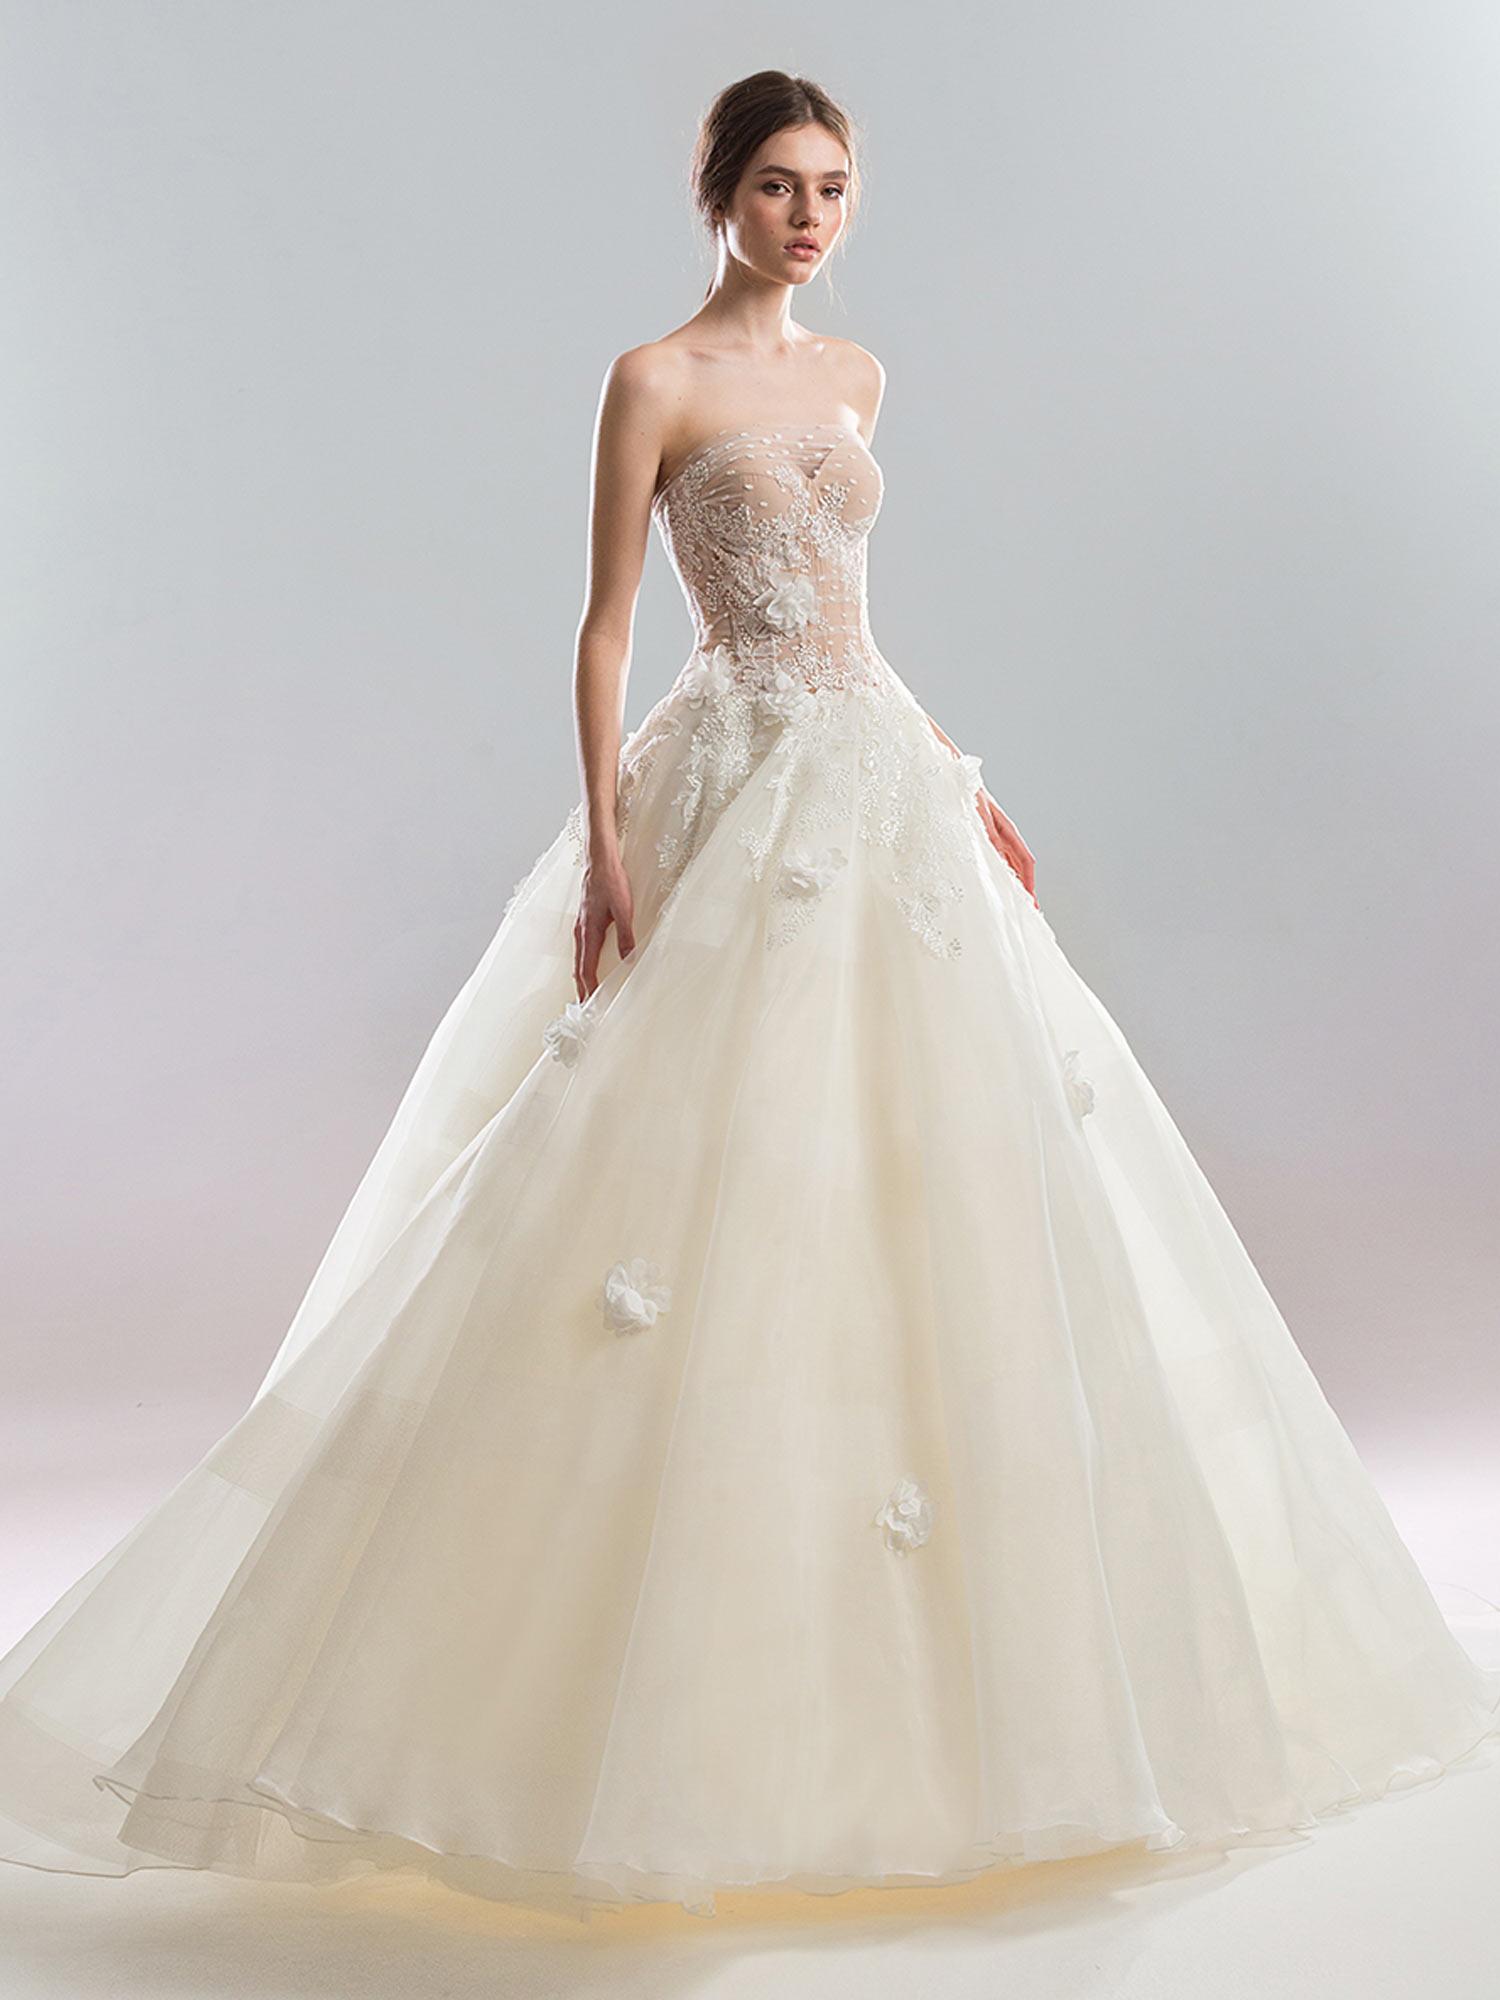 Elegant Ball Gowns | DressedUpGirl.com